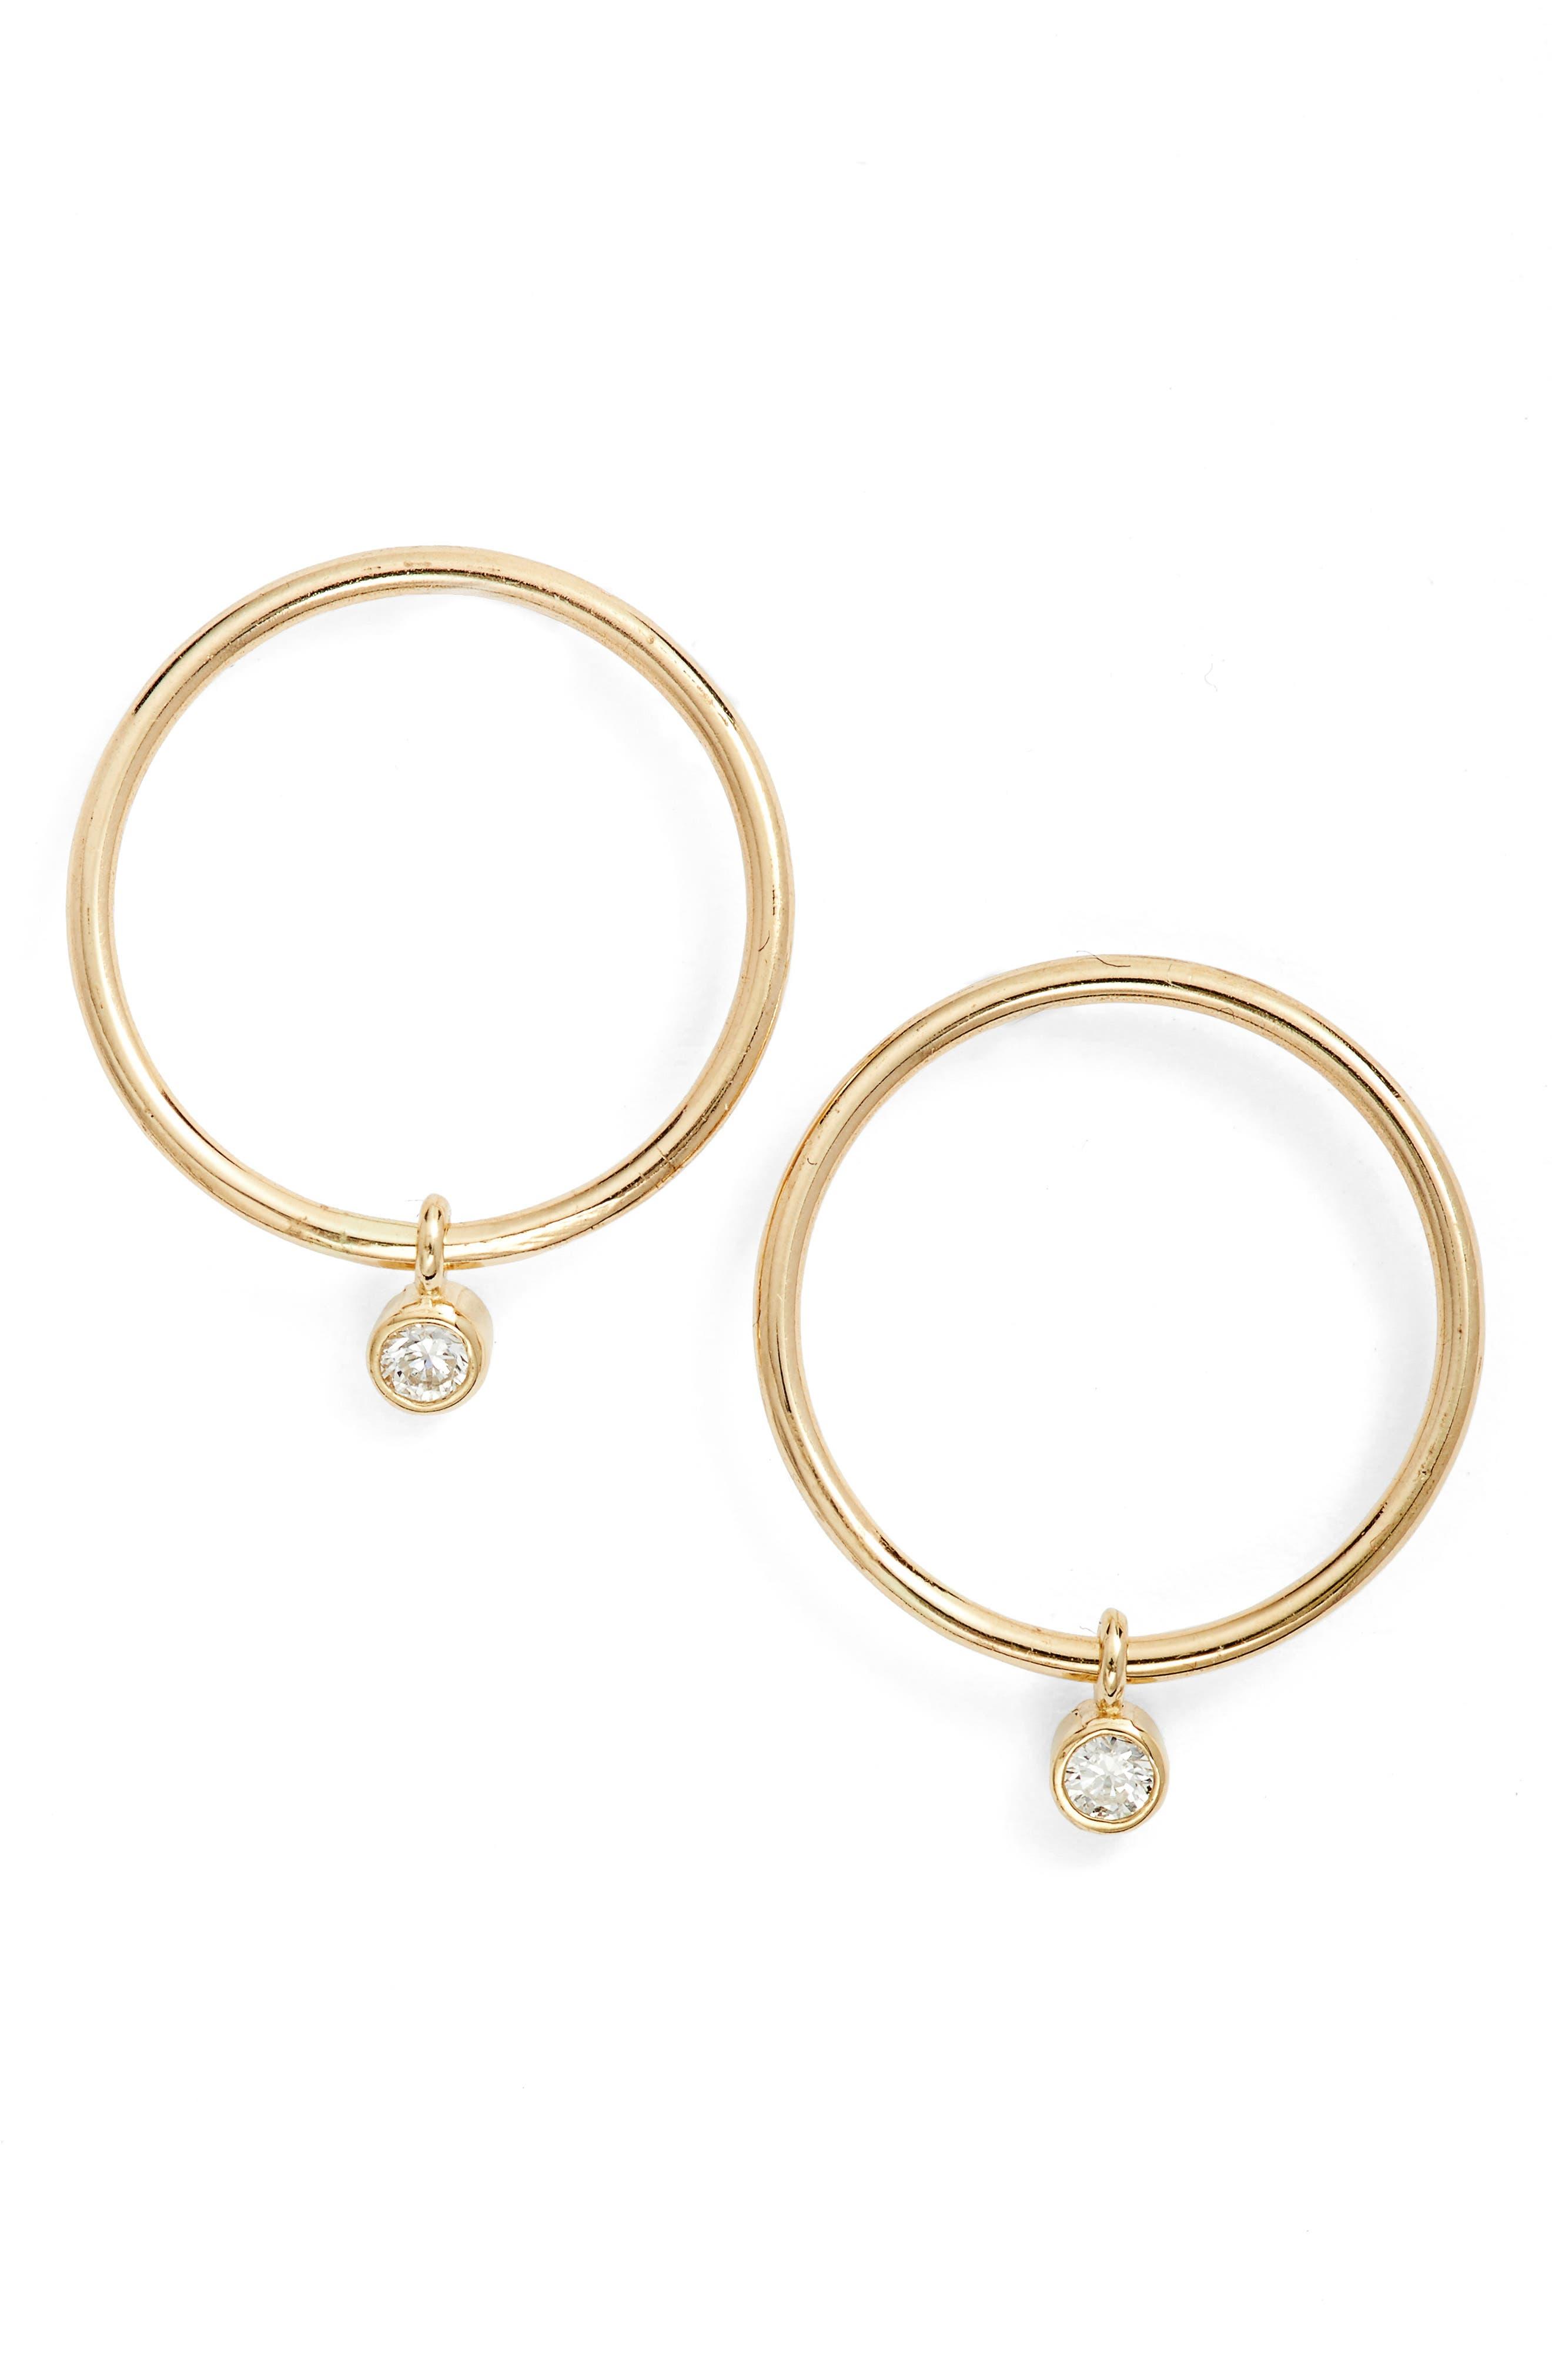 Zoë Chicco Diamond Small Frontal Hoop Earrings